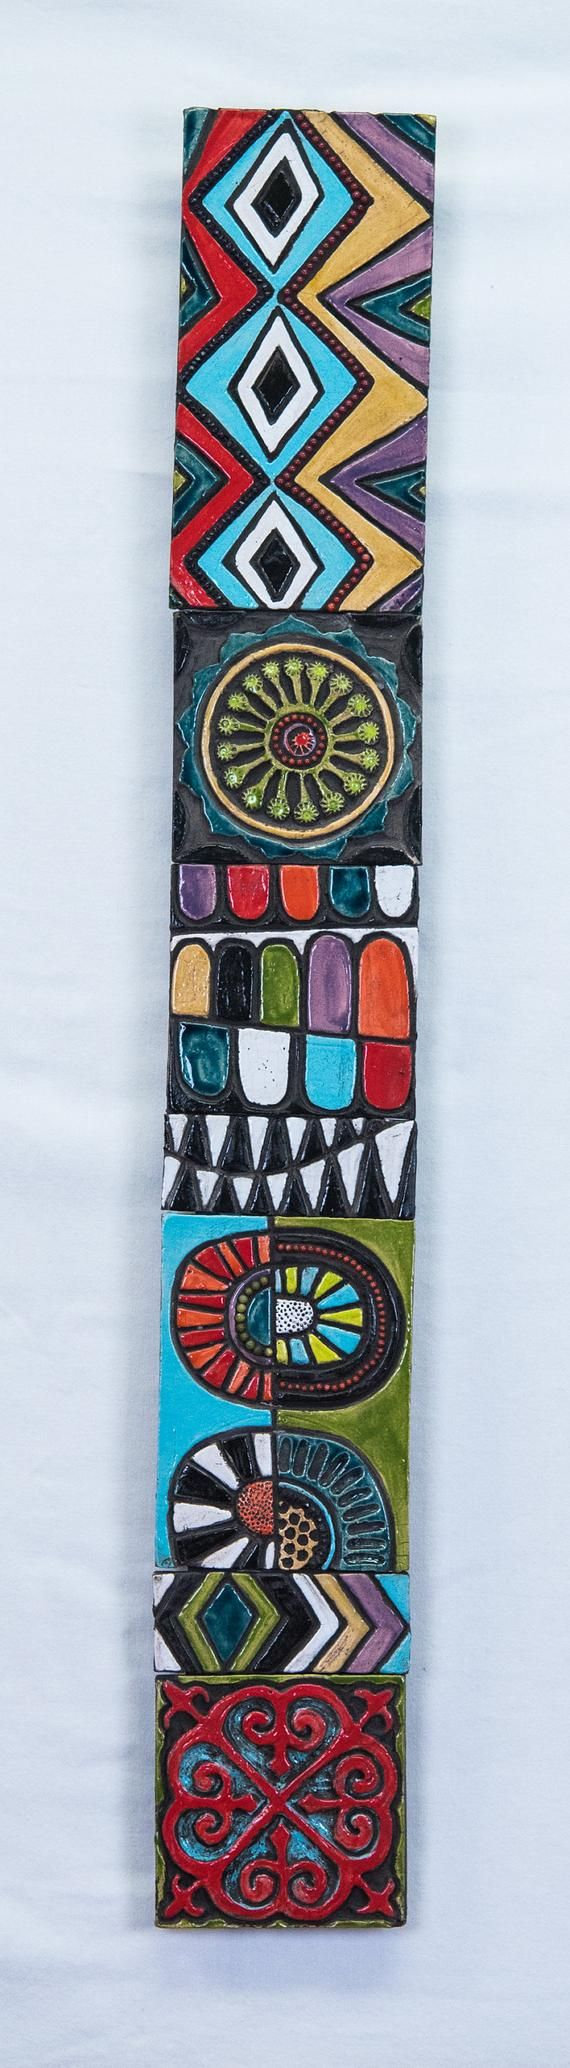 Global Folk Sticks Your Choice Of Pattern Handmade Tile Wall Art